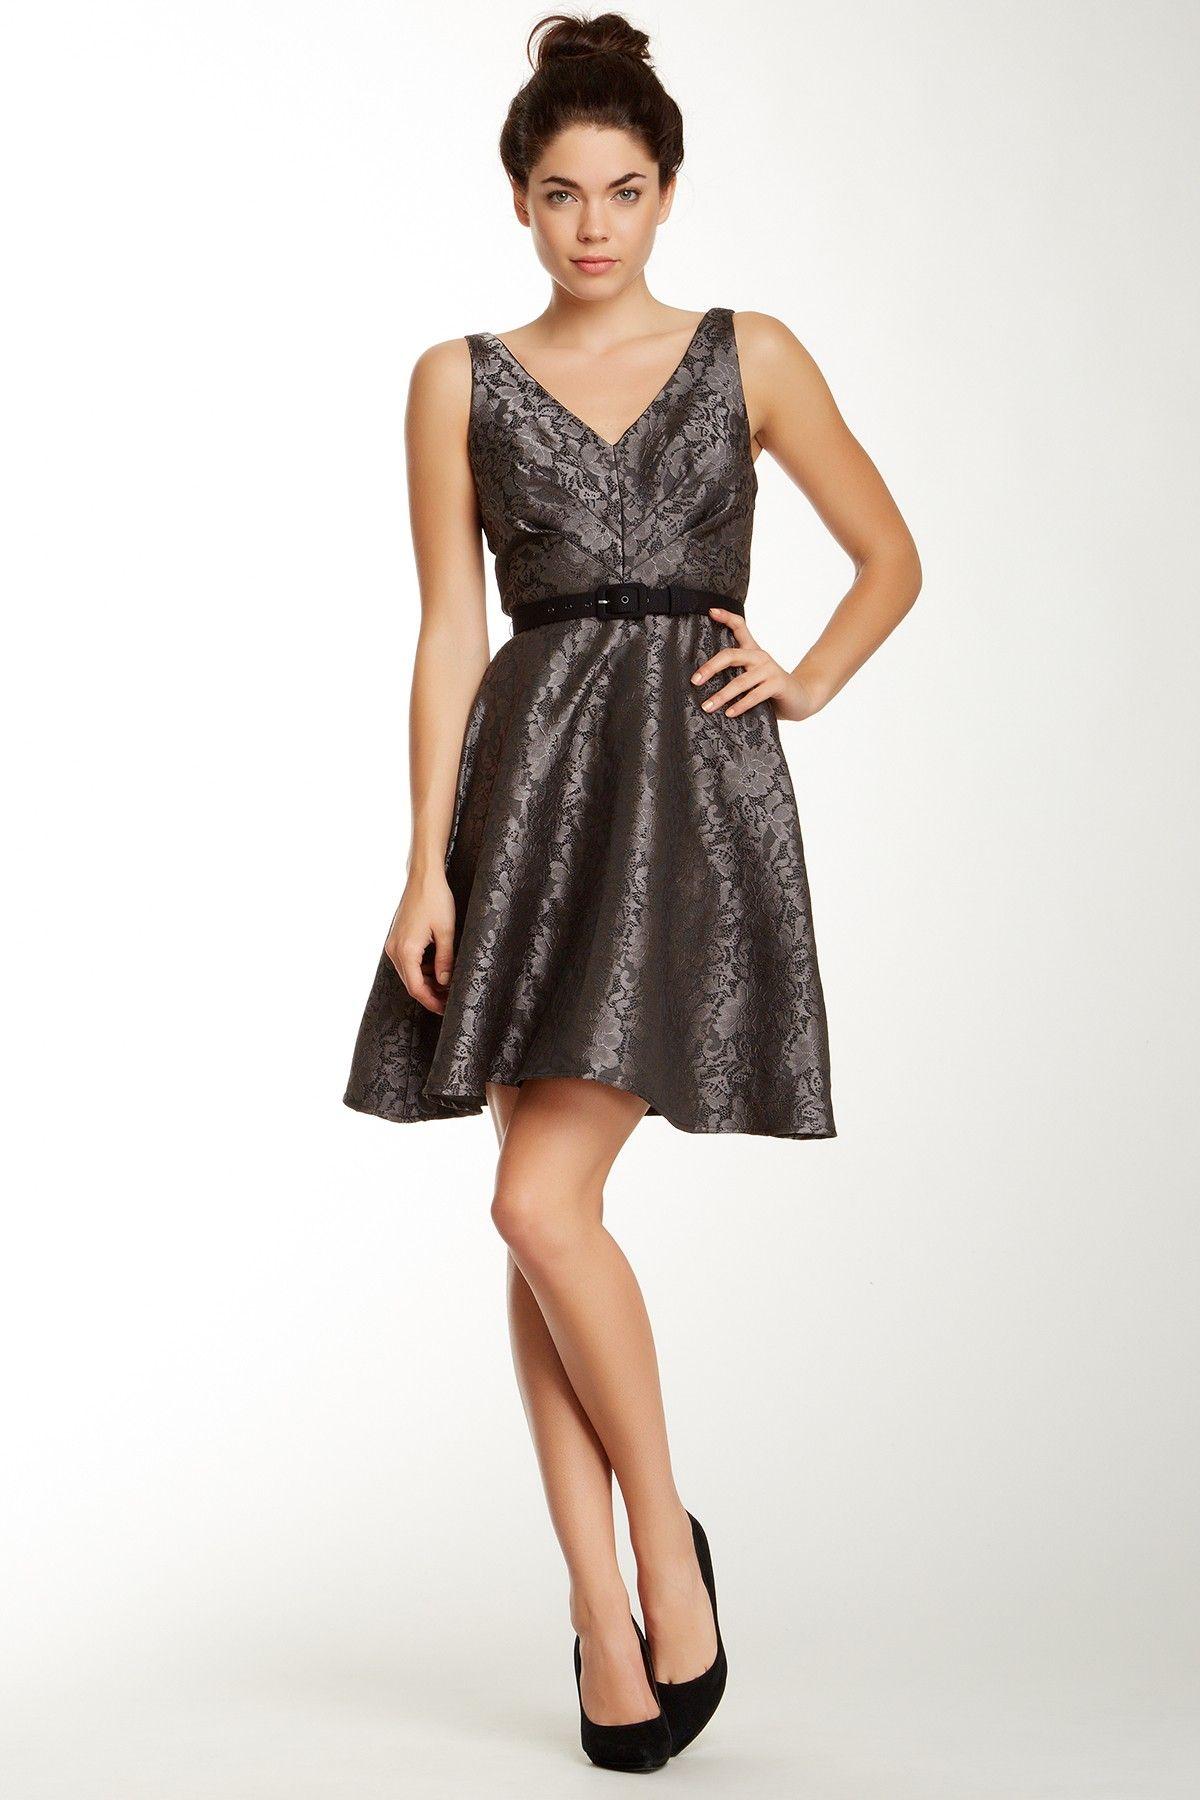 171cc94f5b07 Alexander Metallic Floral Dress